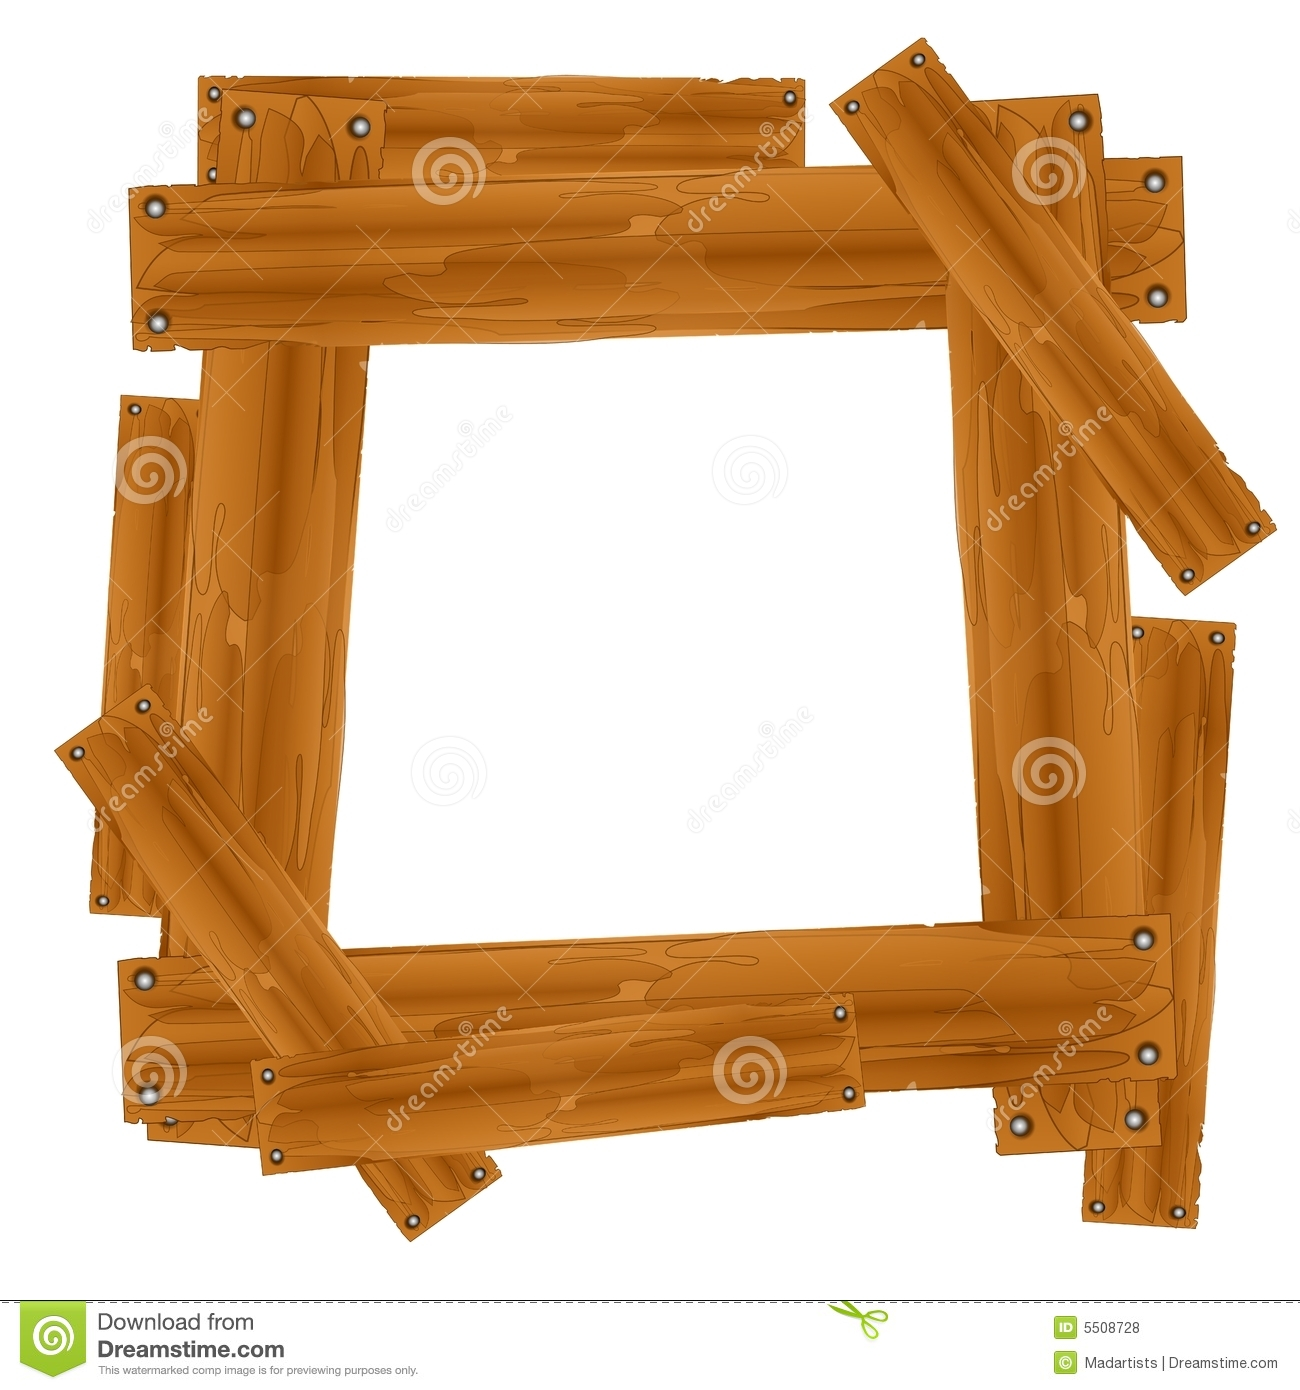 Planks clipart wood border #2